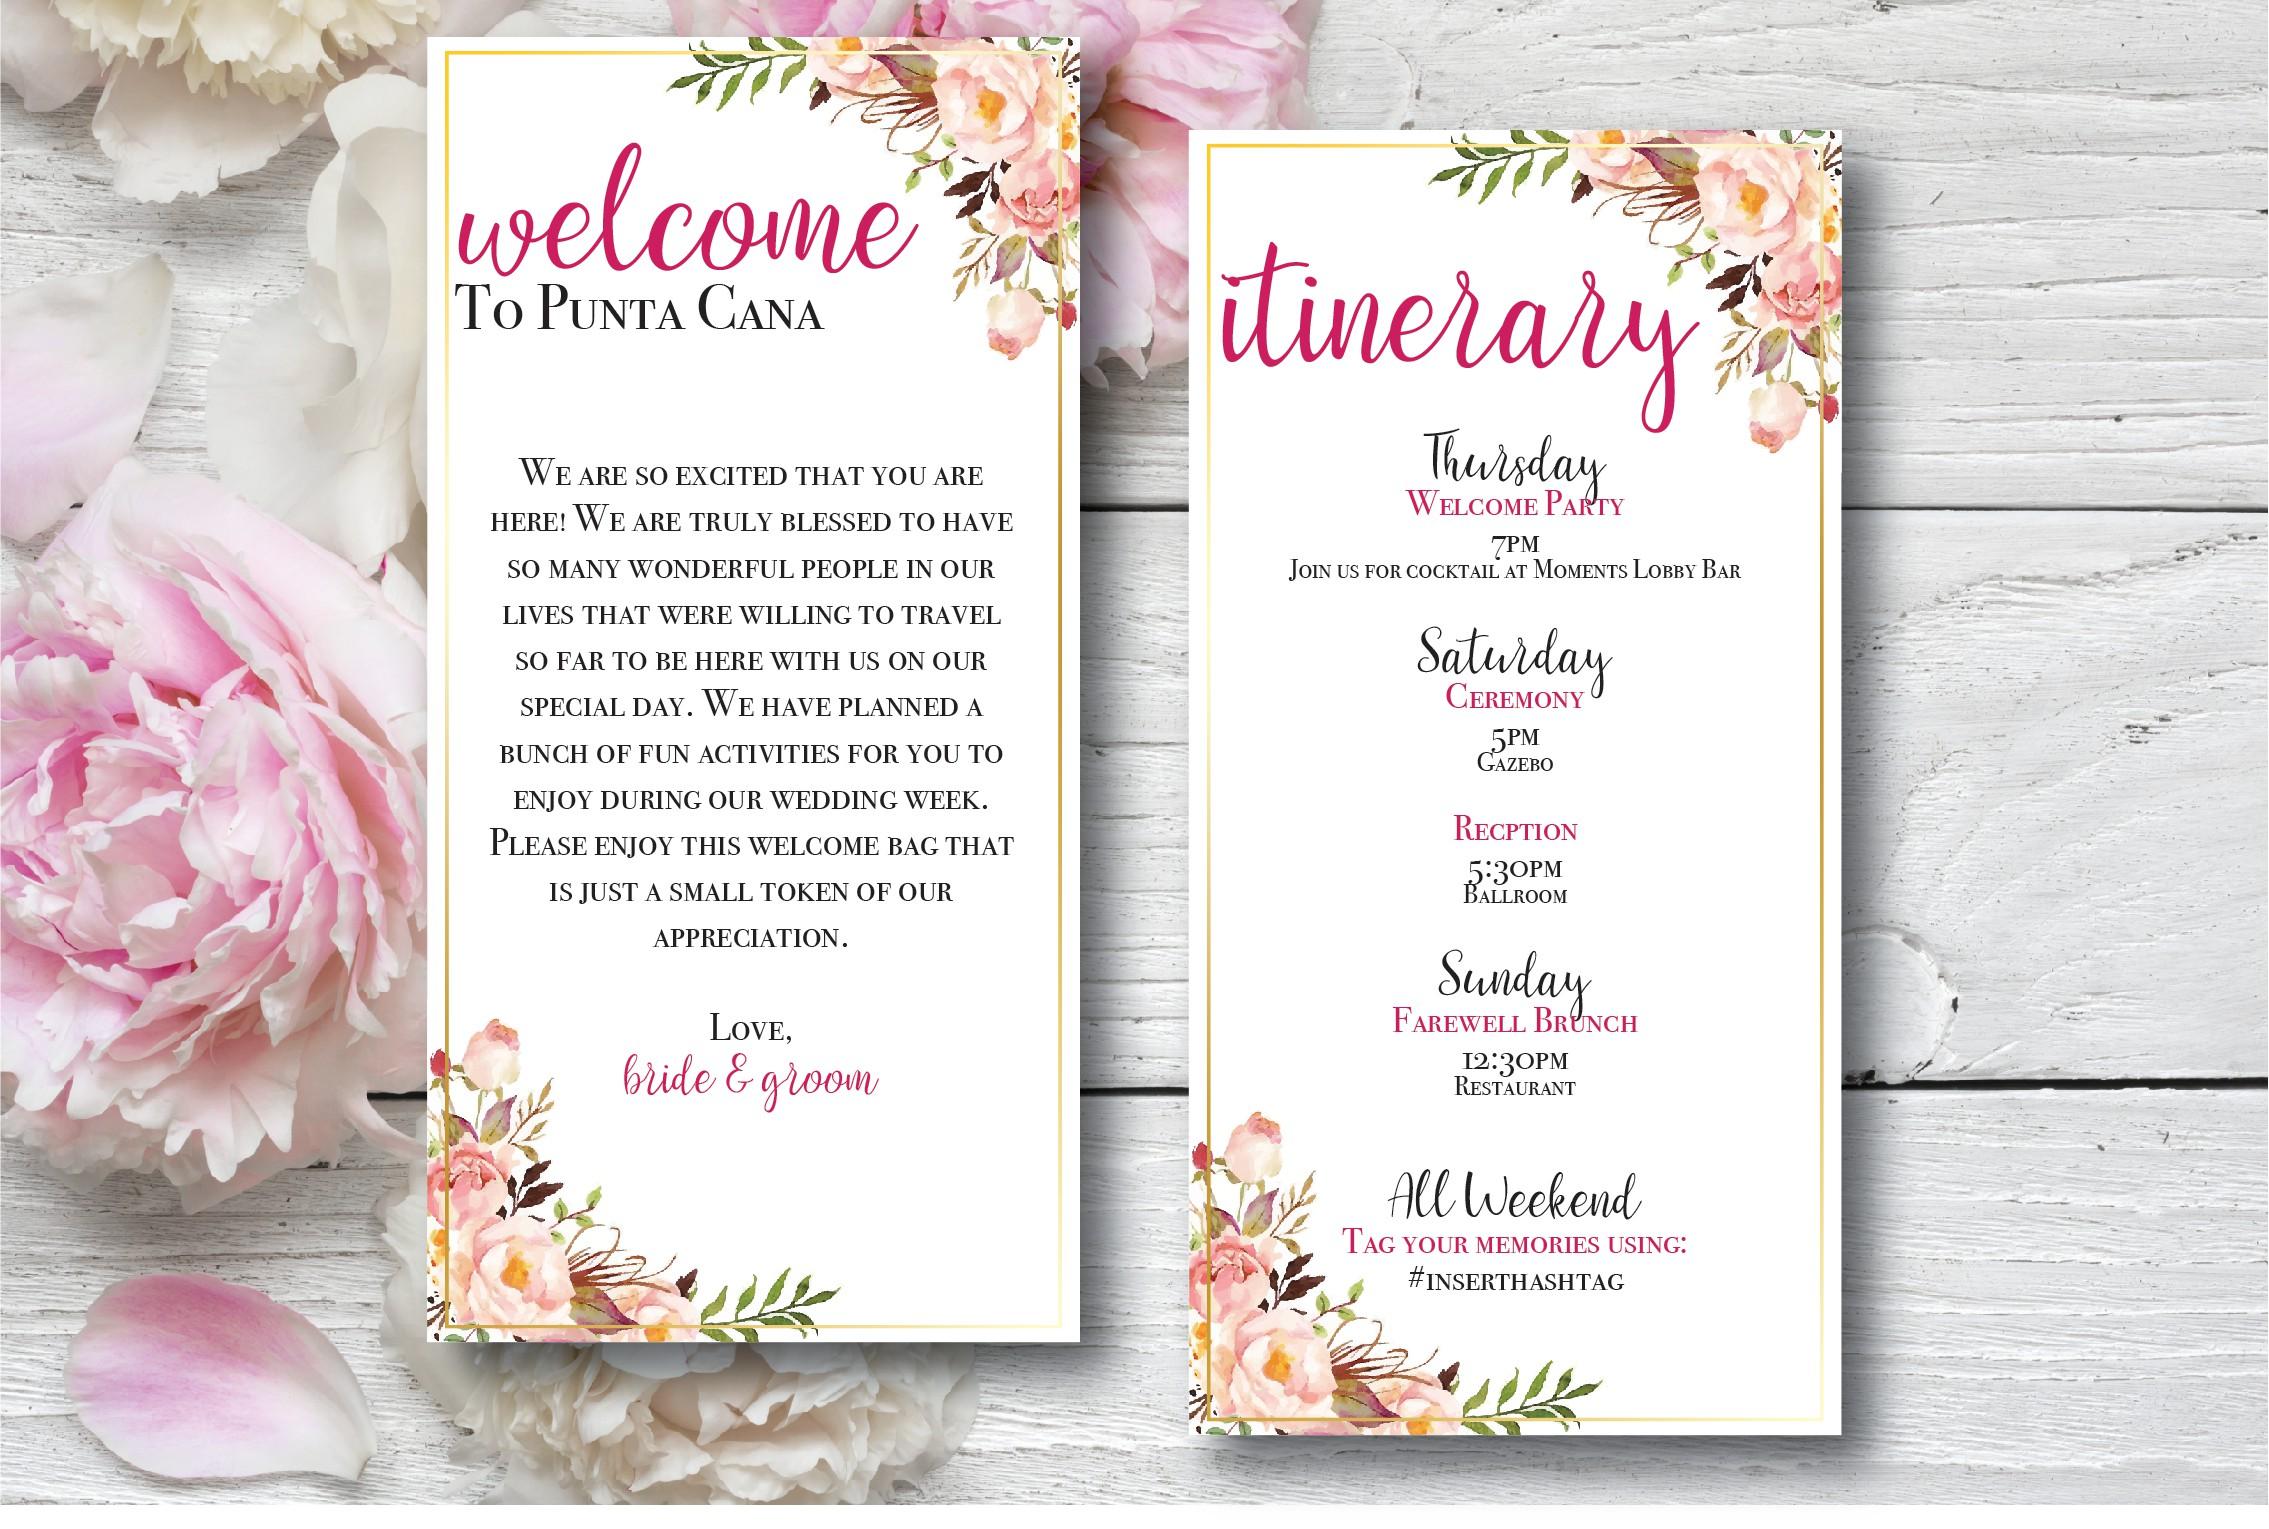 Creative Destination Wedding Ideas Destination Wedding Details - sample wedding brochure